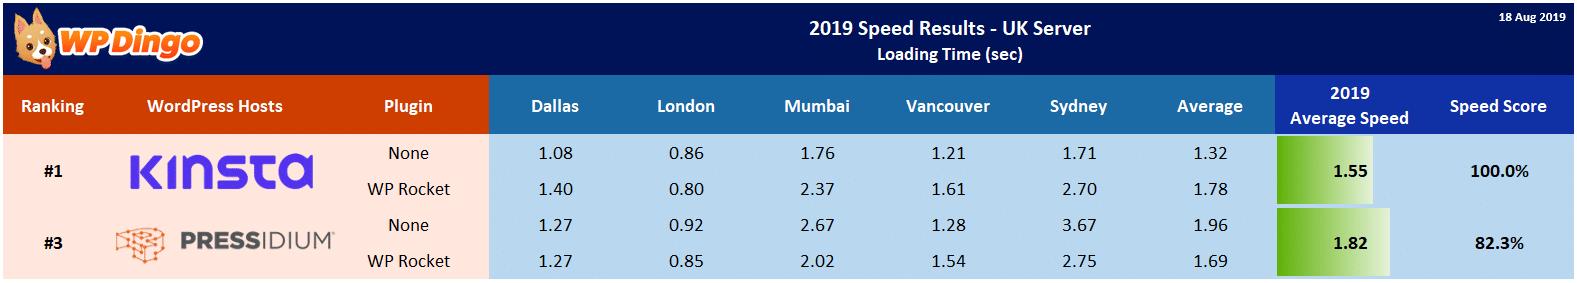 2019 Kinsta vs Pressidium Speed Table - UK Server